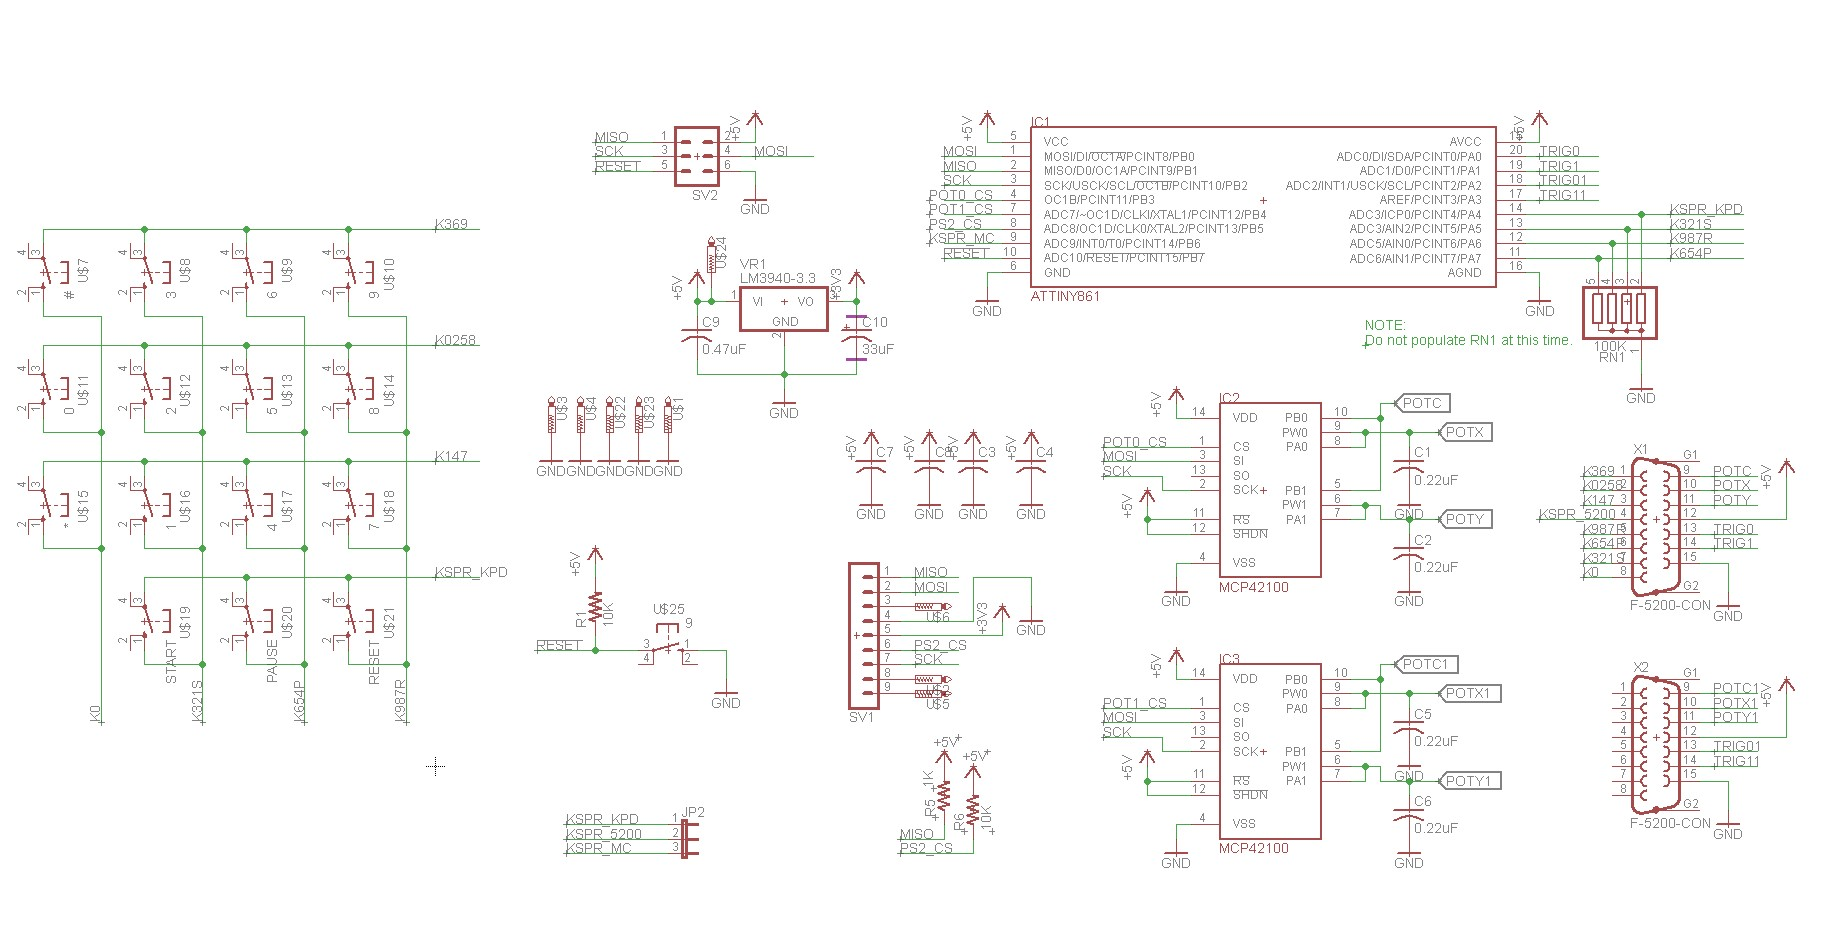 atari 5200 ps2 controller adapter schematic